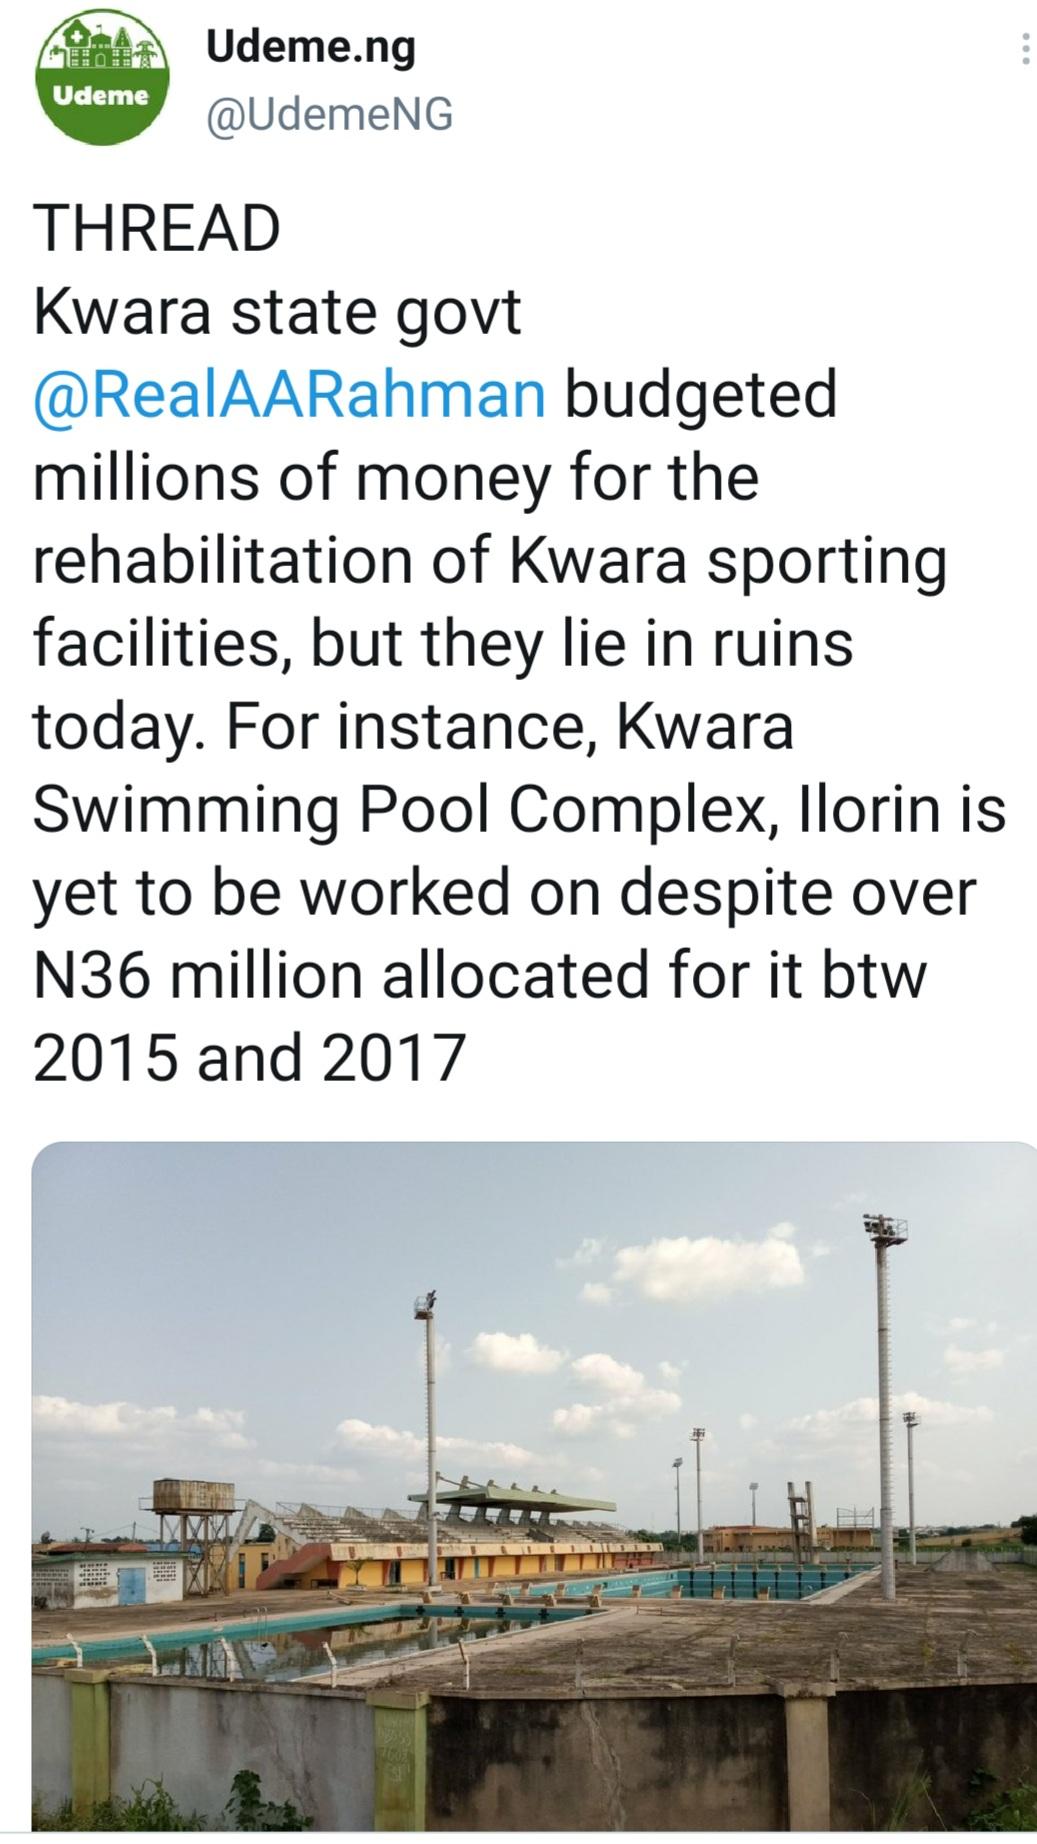 Kwara State commences rehabilitation project after Udeme report